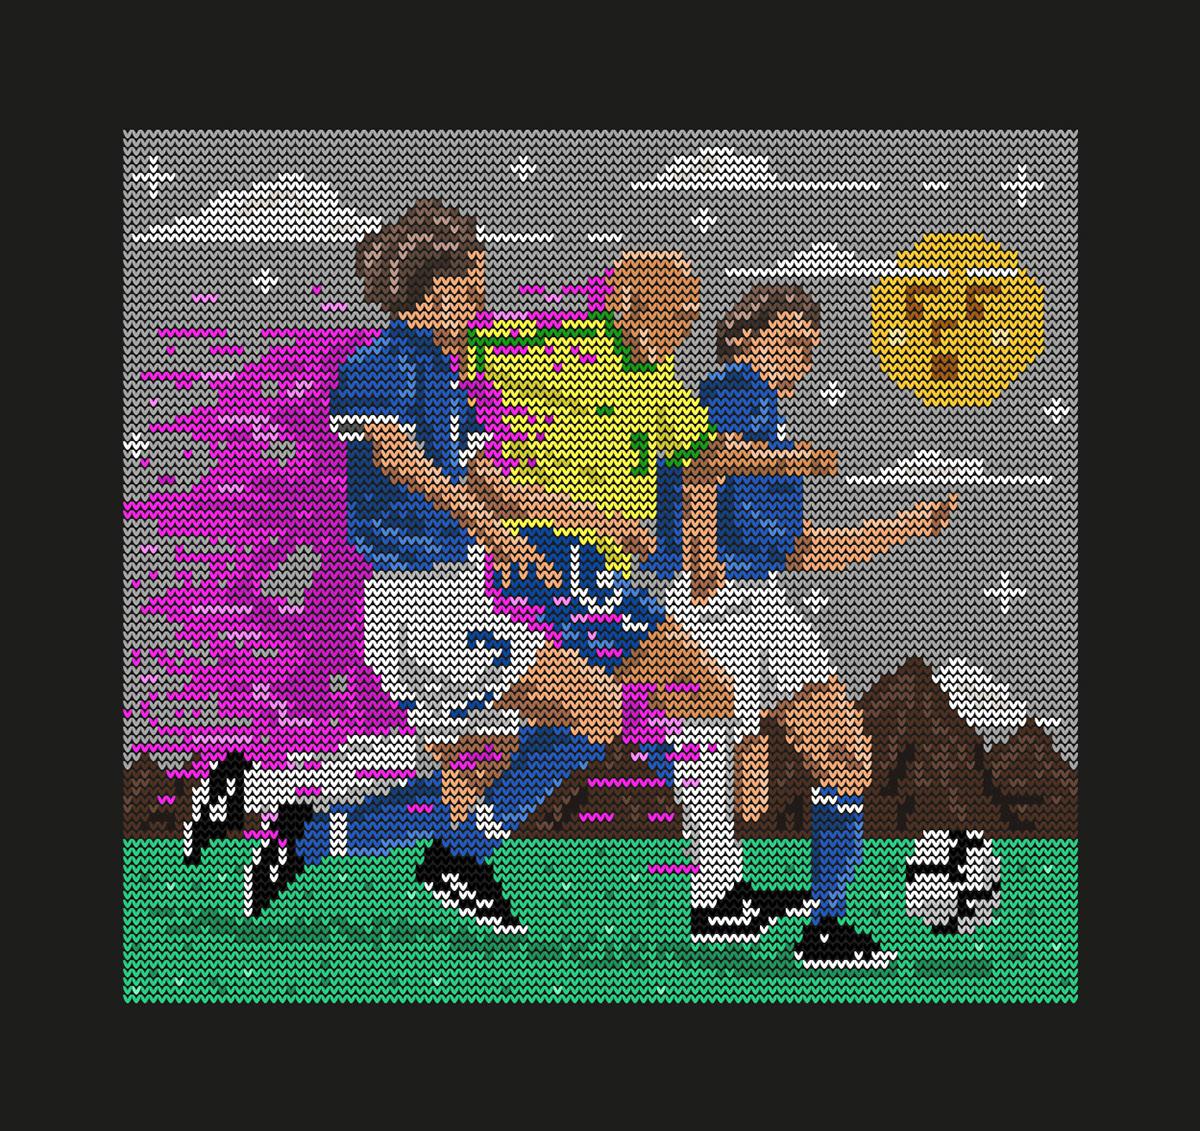 Brasil football Futbol futebol ILLUSTRATION  ilustracion italia Ronaldo stitch surreal